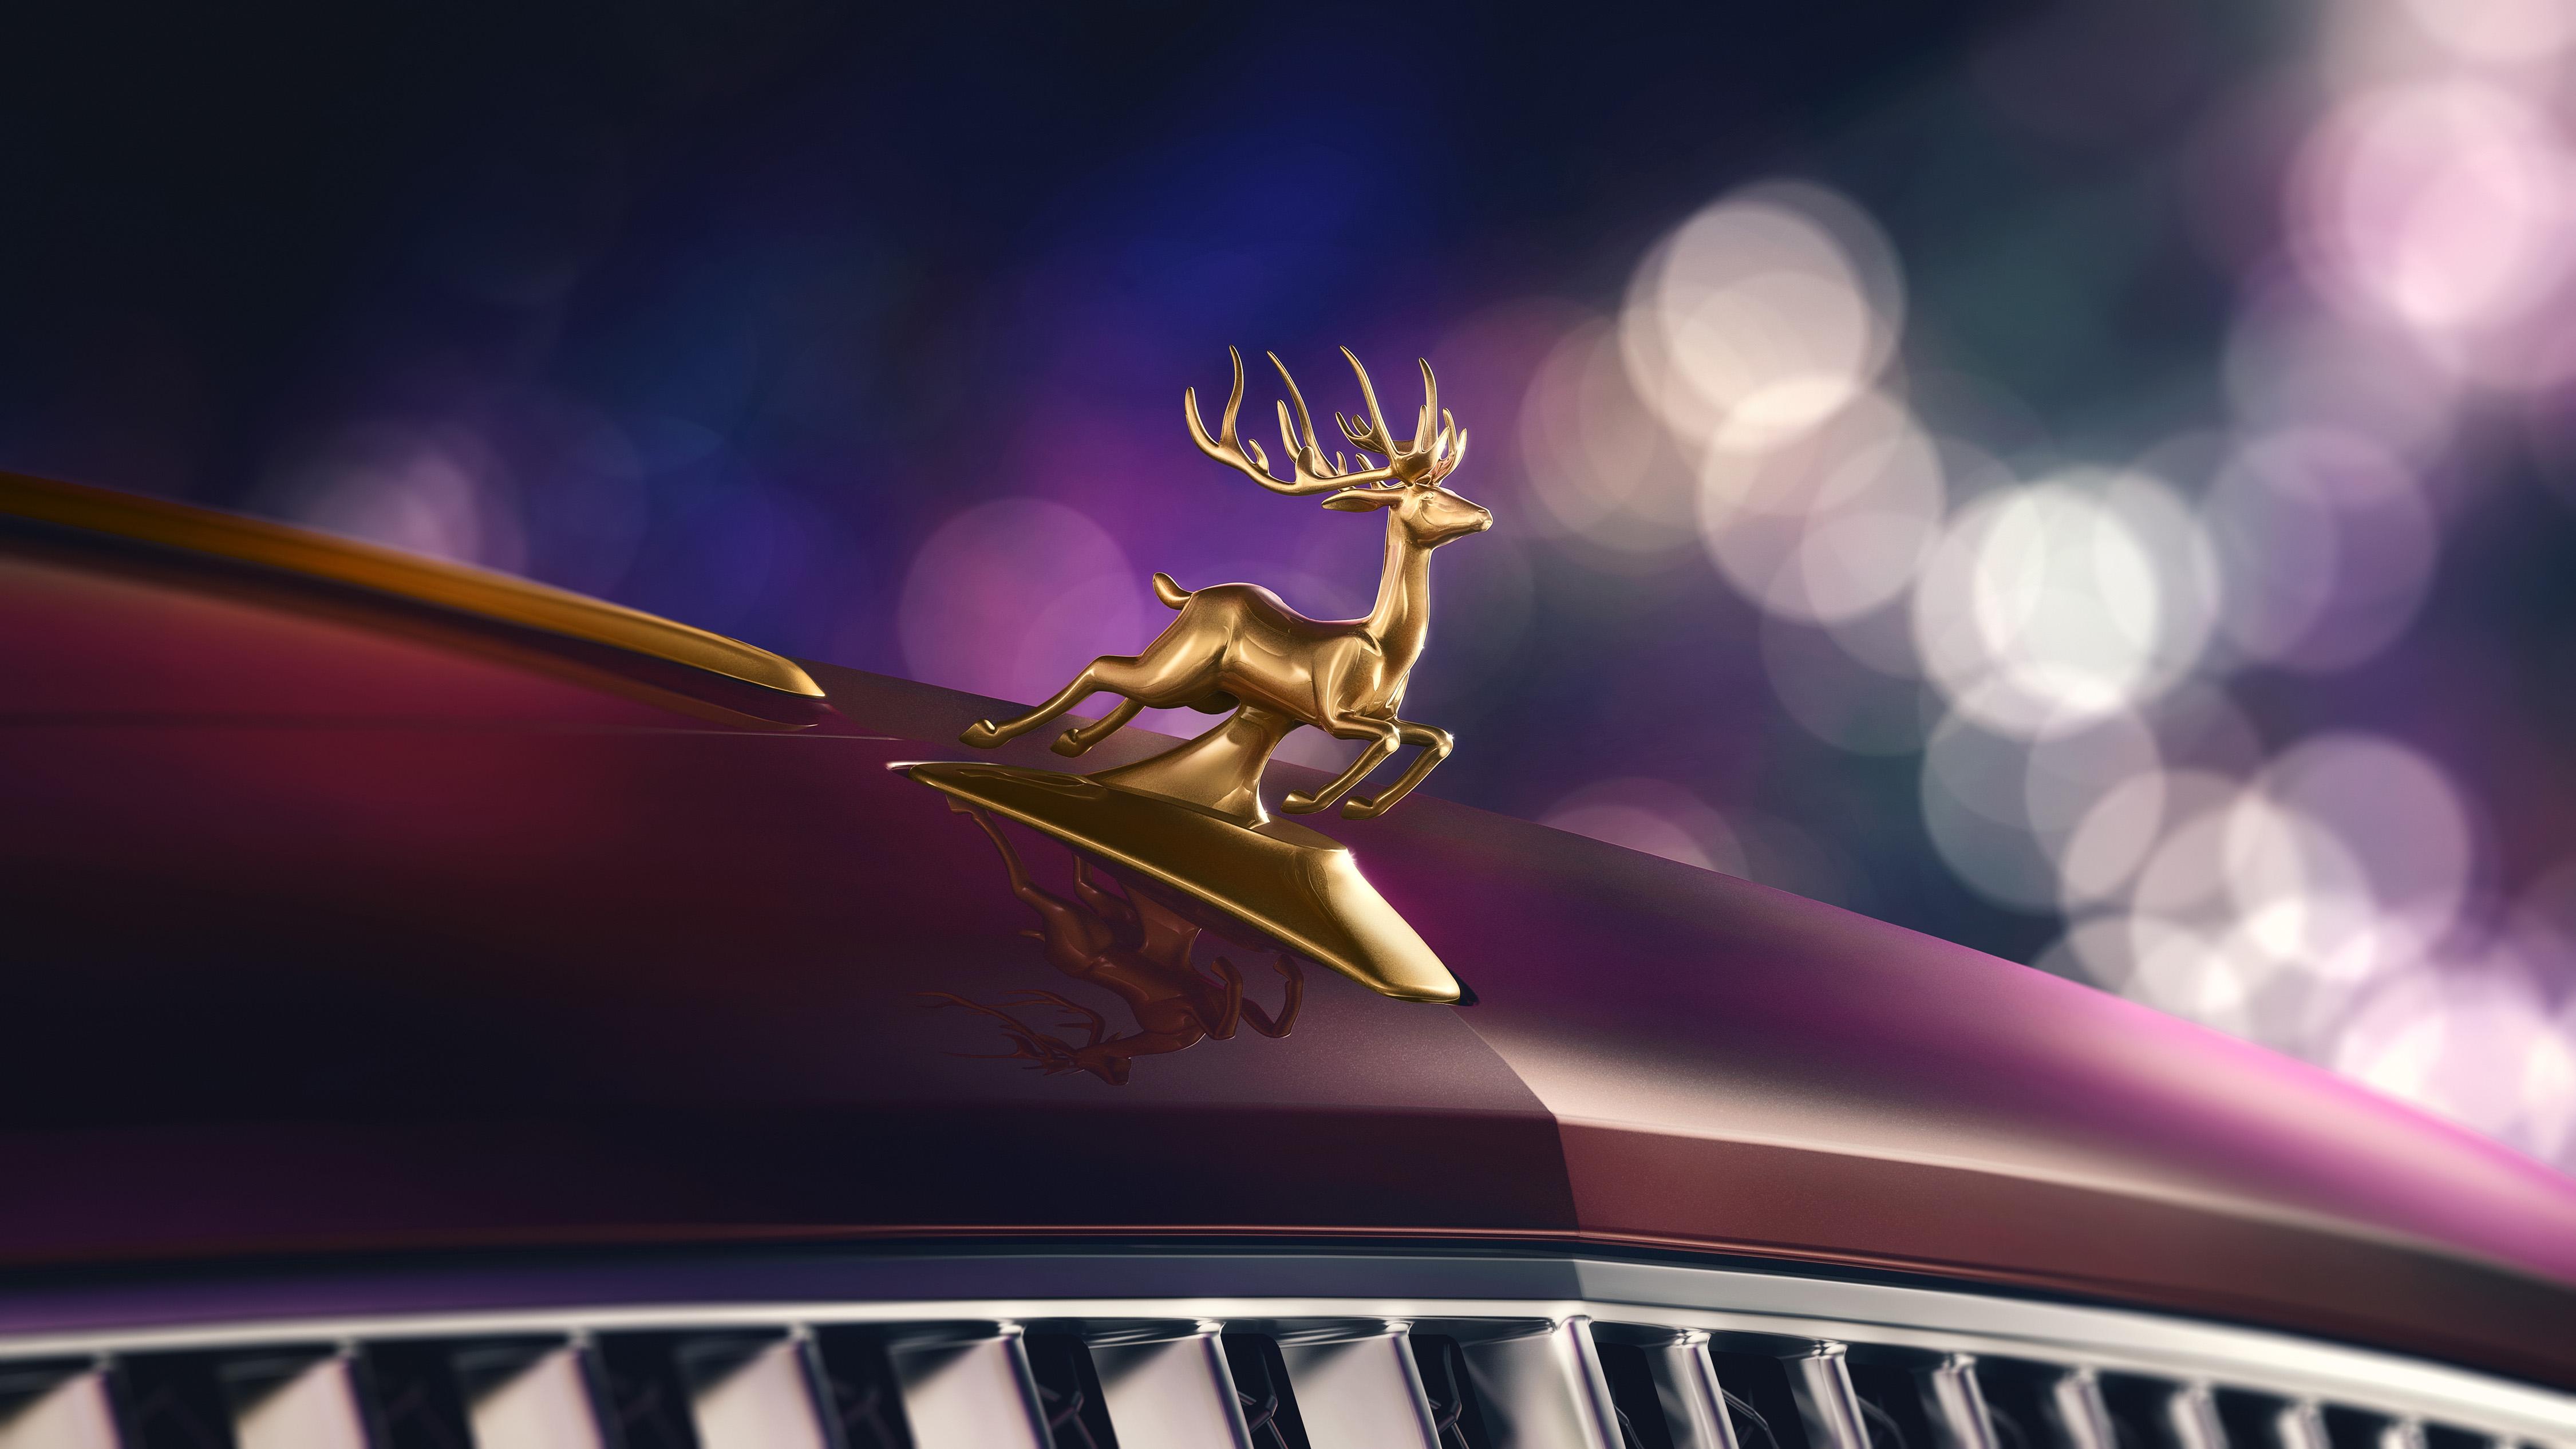 Bentley Flying Spur Christmas Edition